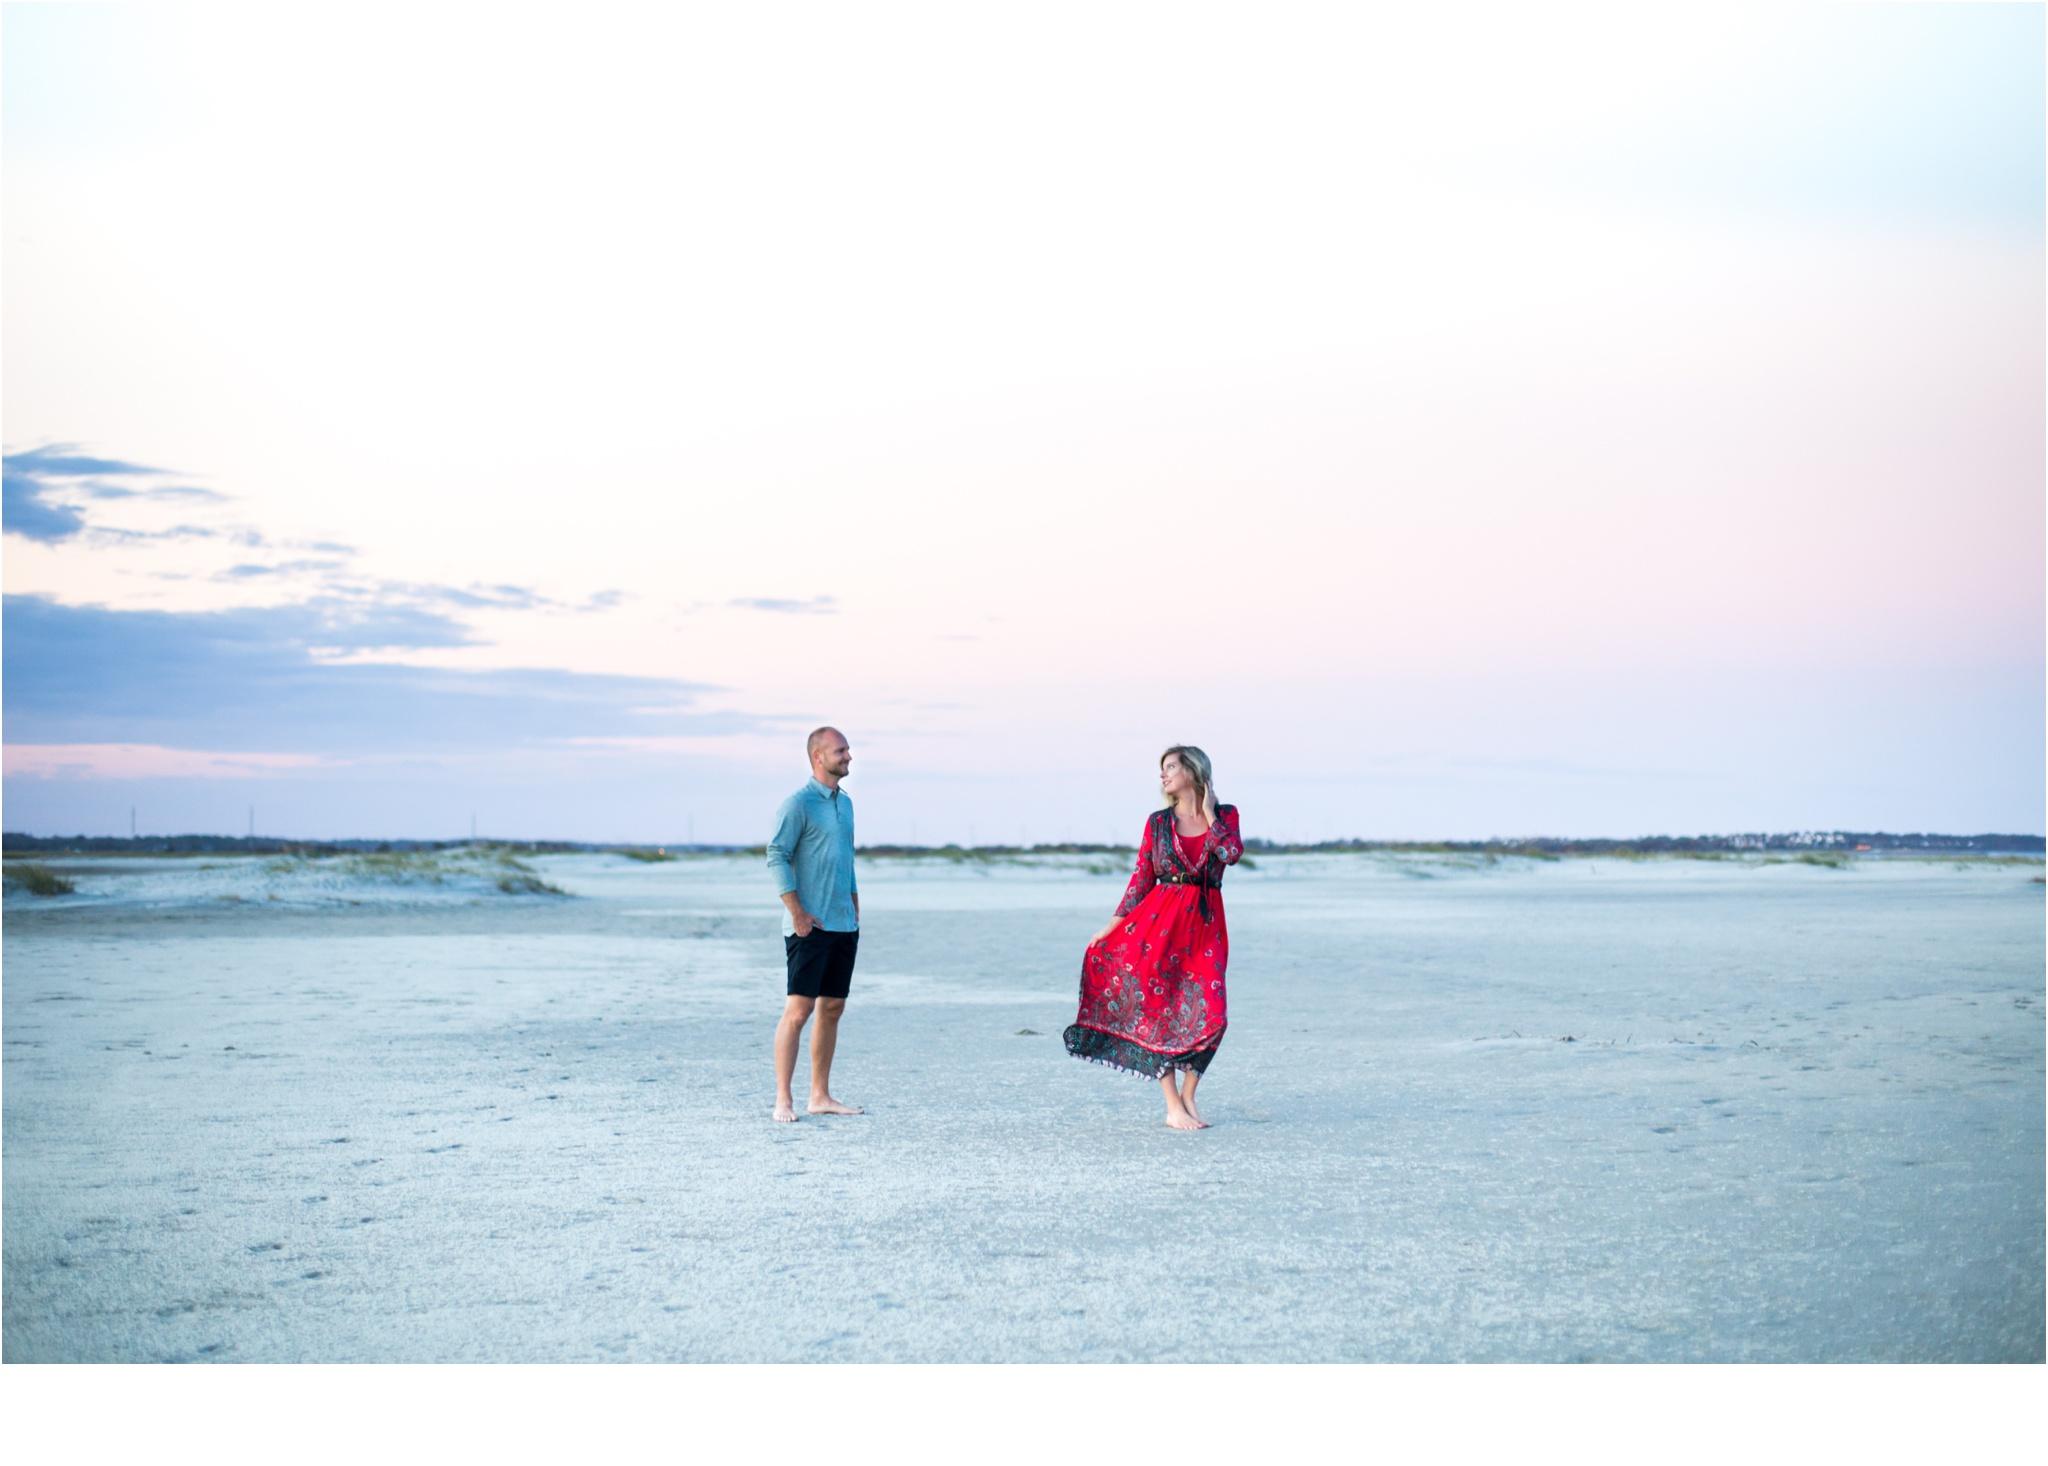 Rainey_Gregg_Photography_St._Simons_Island_Georgia_California_Wedding_Portrait_Photography_0273.jpg